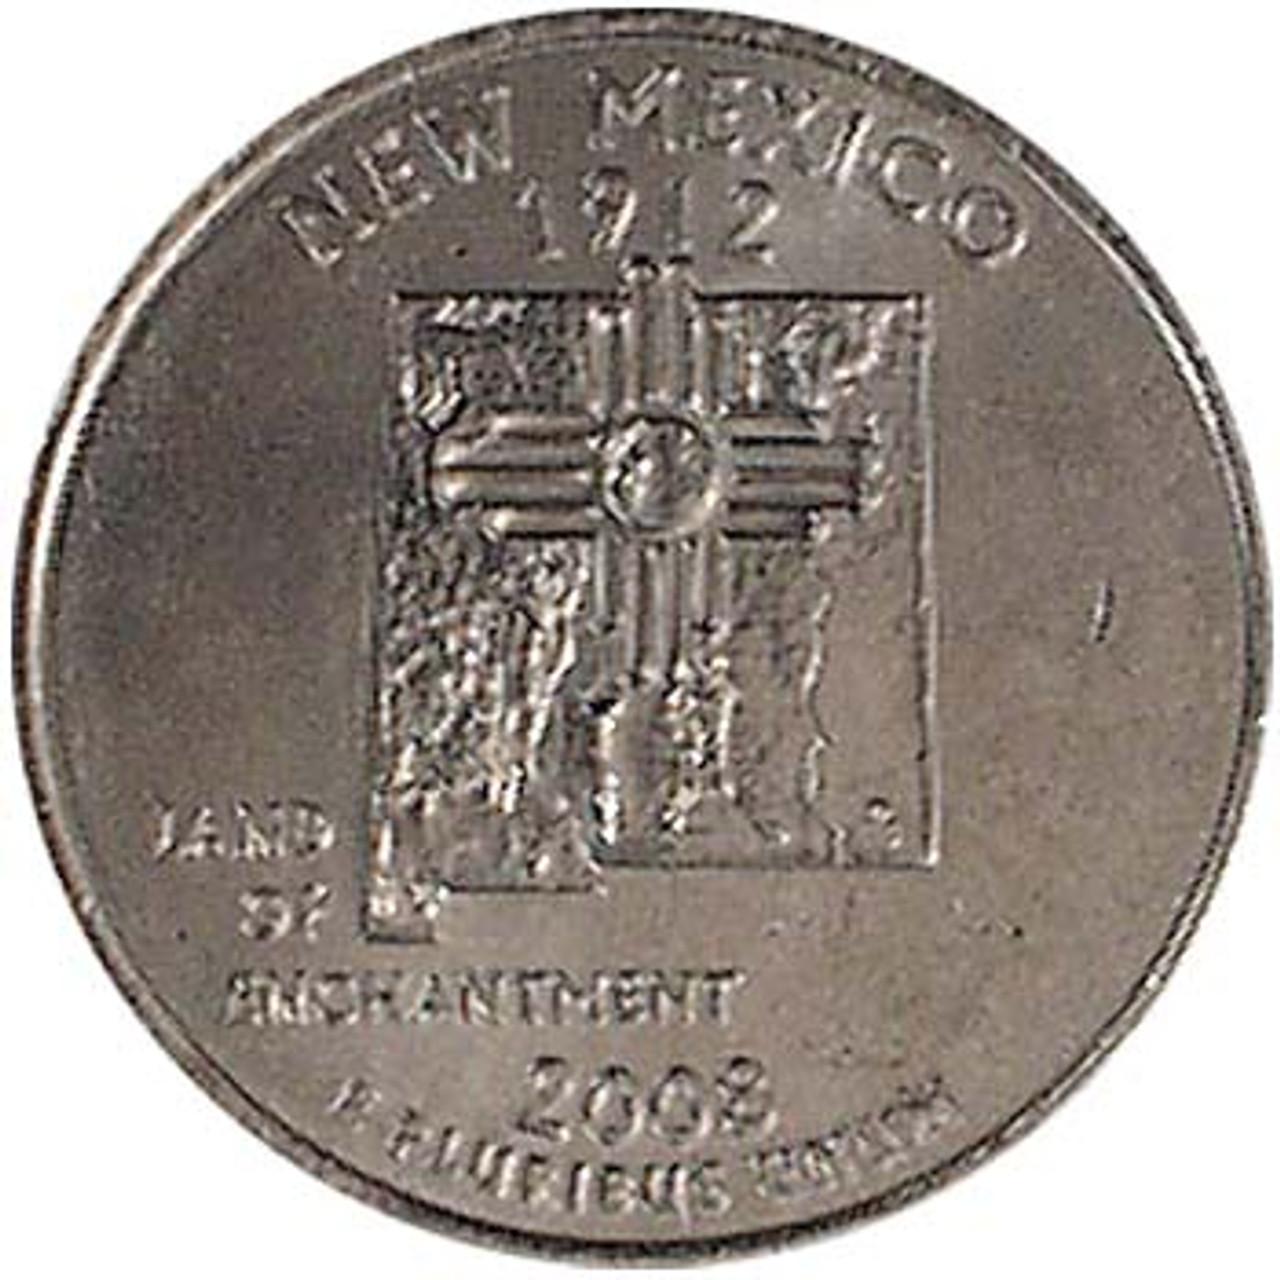 2008-D New Mexico Quarter Brilliant Uncirculated Image 1